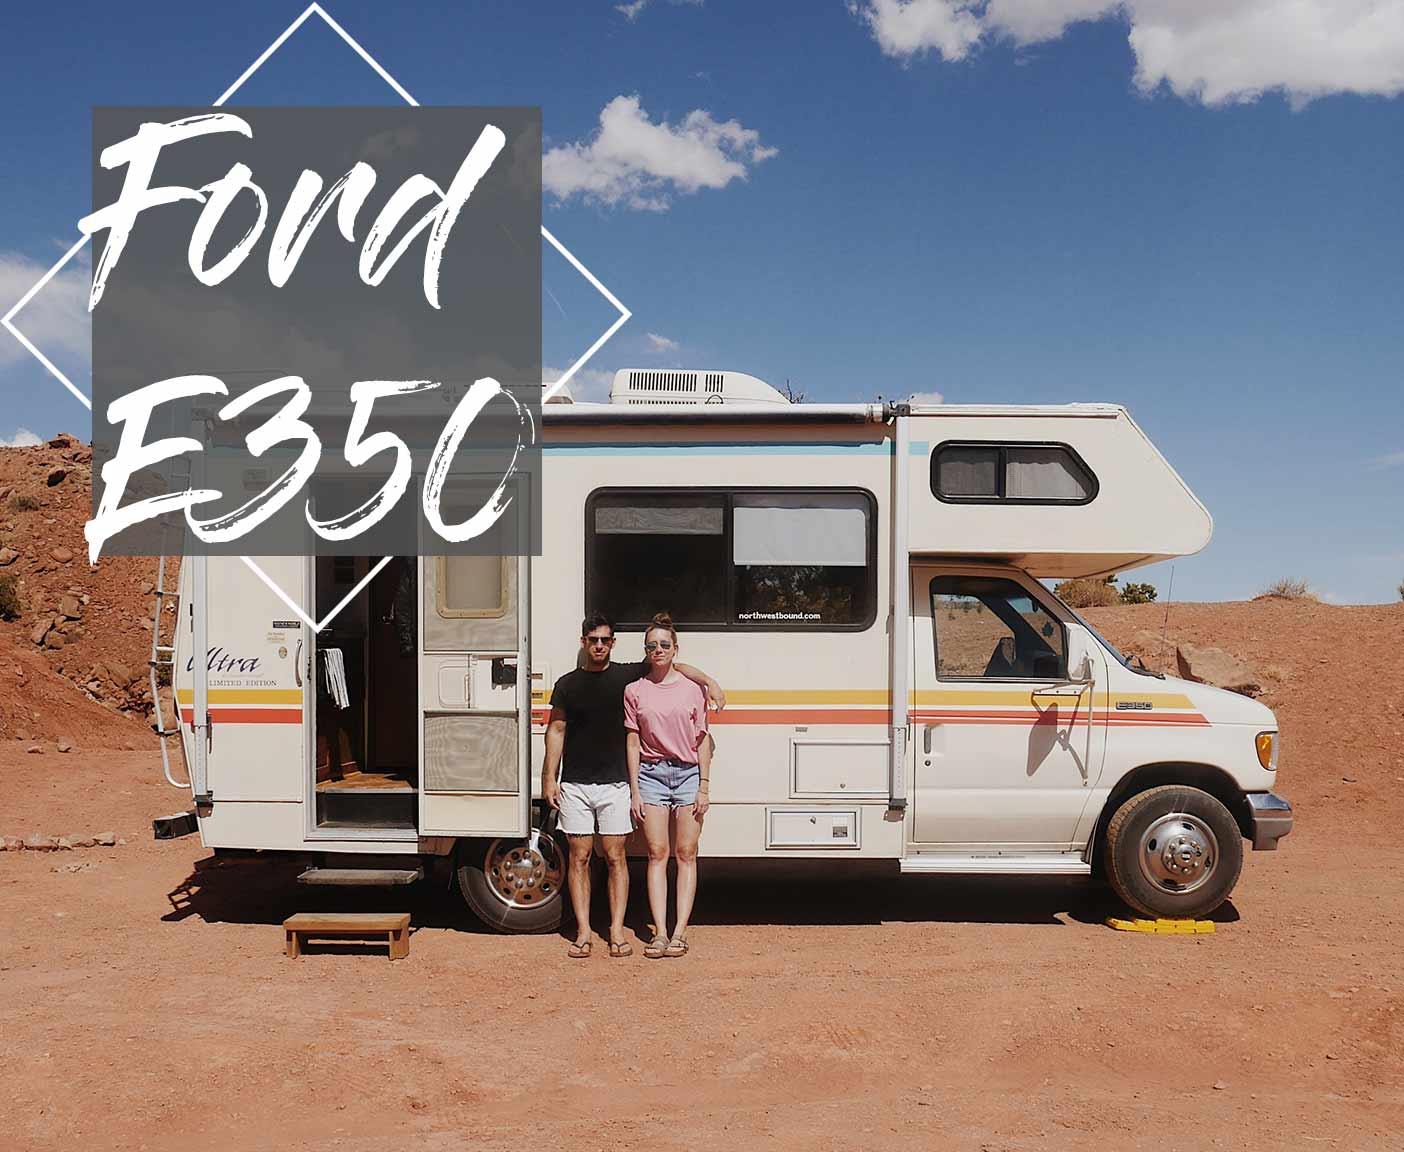 Ford-E350-Van-Wohnmobil-super-duty-roadtrip-vanlife-camper